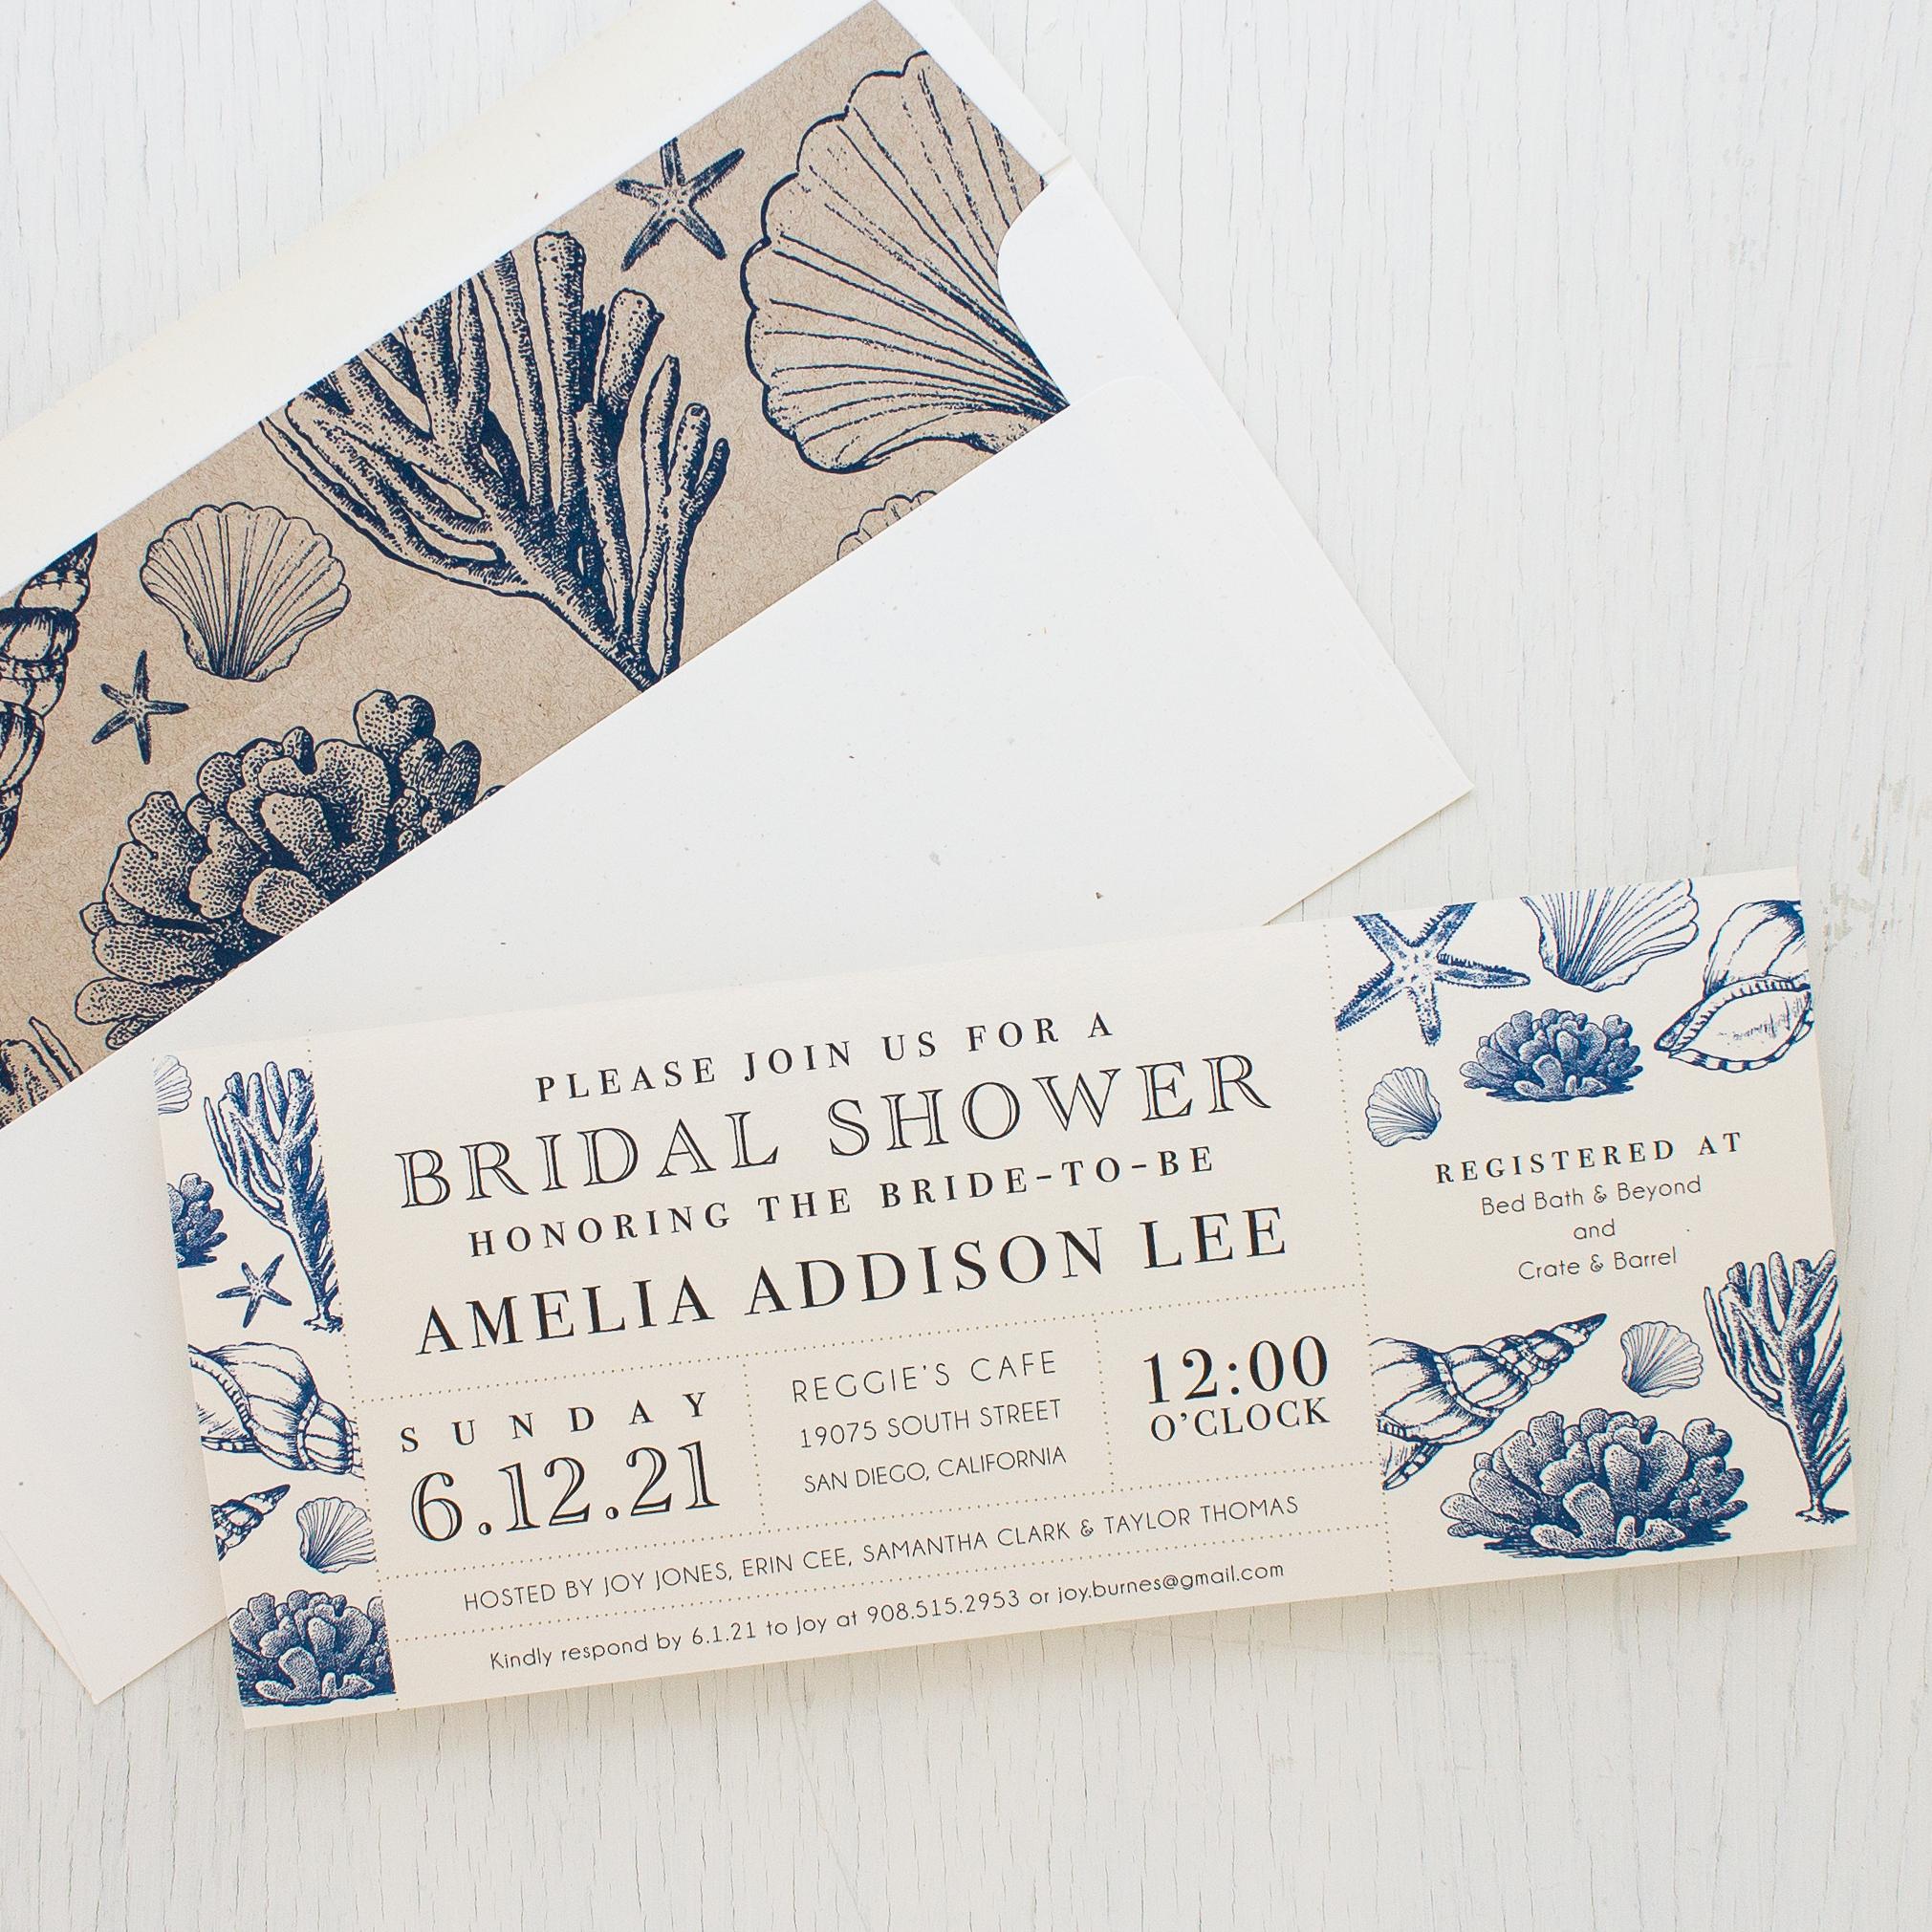 Beach blues bridal shower invitations beacon lane beach blues bridal shower invitations filmwisefo